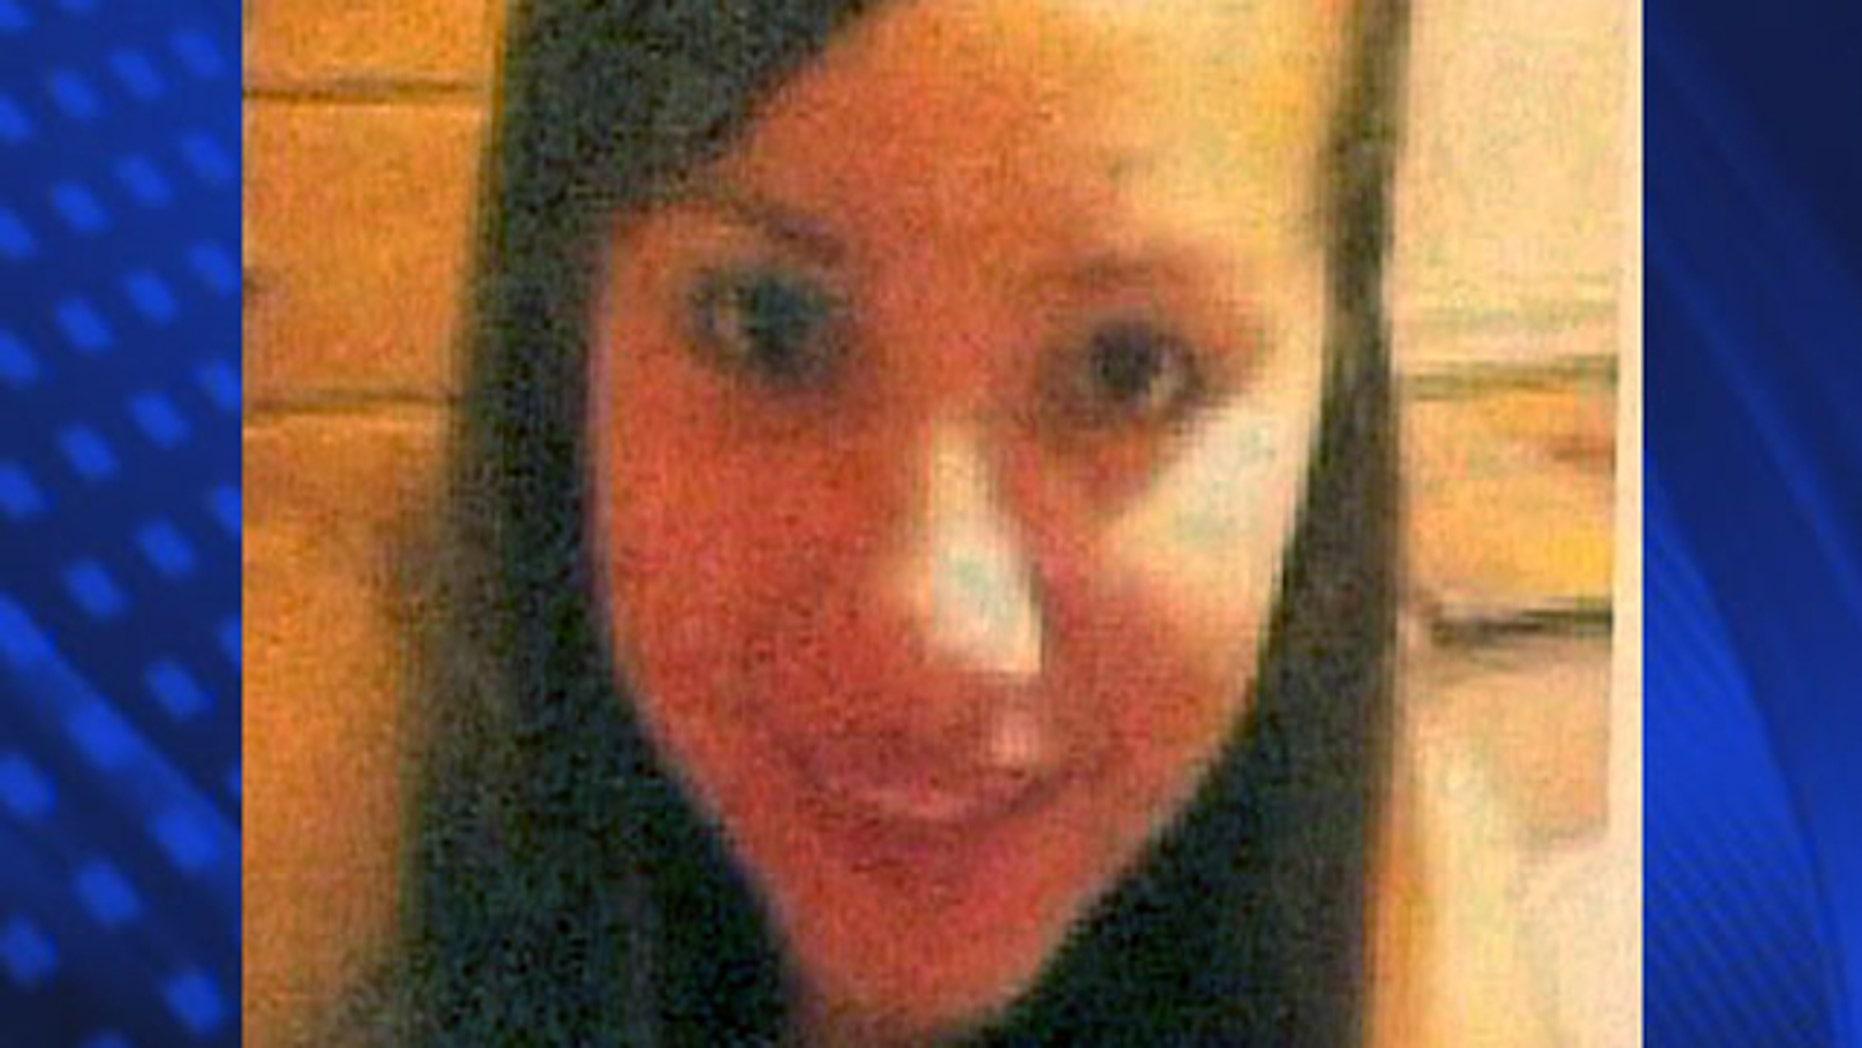 Miranda Hemphill (MyFoxLA.com)